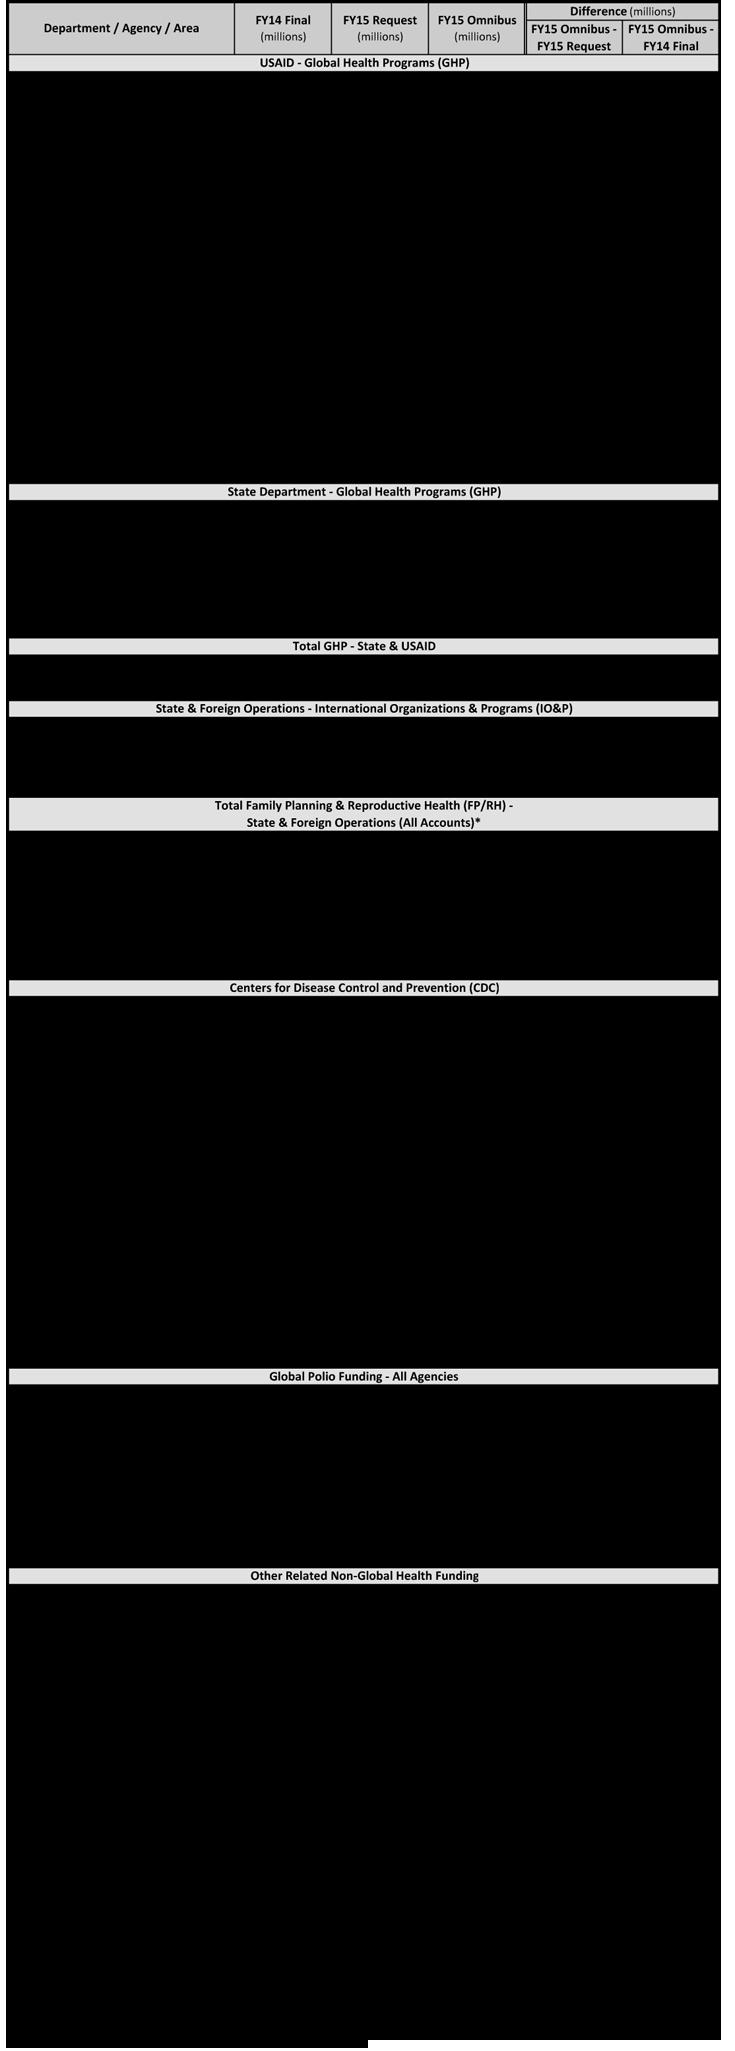 FY15 CROmnibus - PT Entry (12-9-14) Table 1